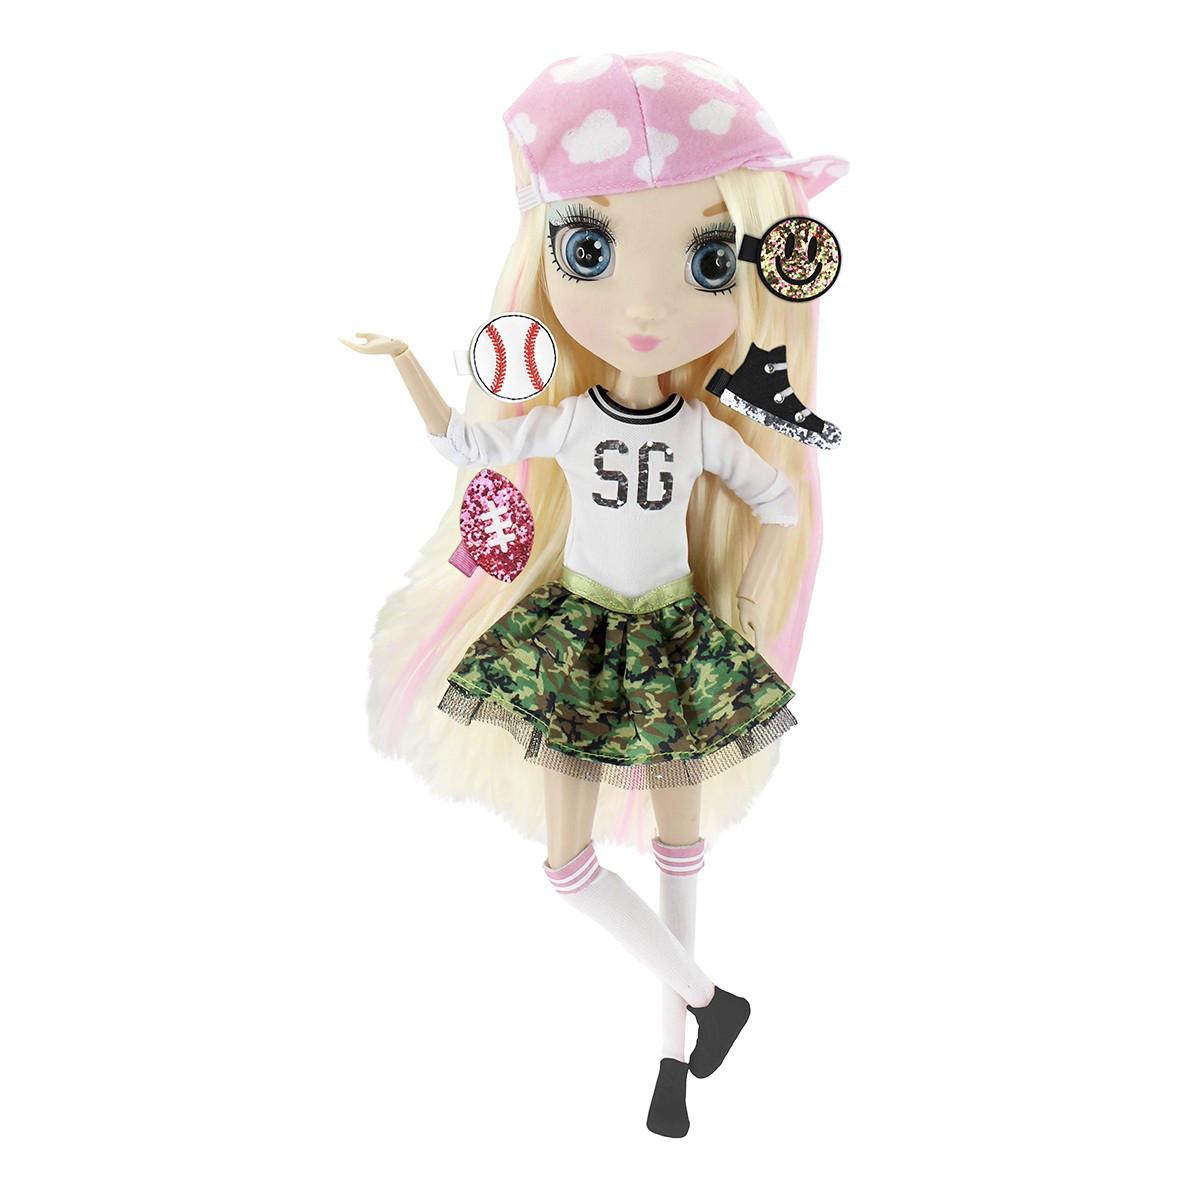 Кукла SHIBAJUKU S3 - МИКИ (33 см, 6 точек артикуляции, с аксессуарами)